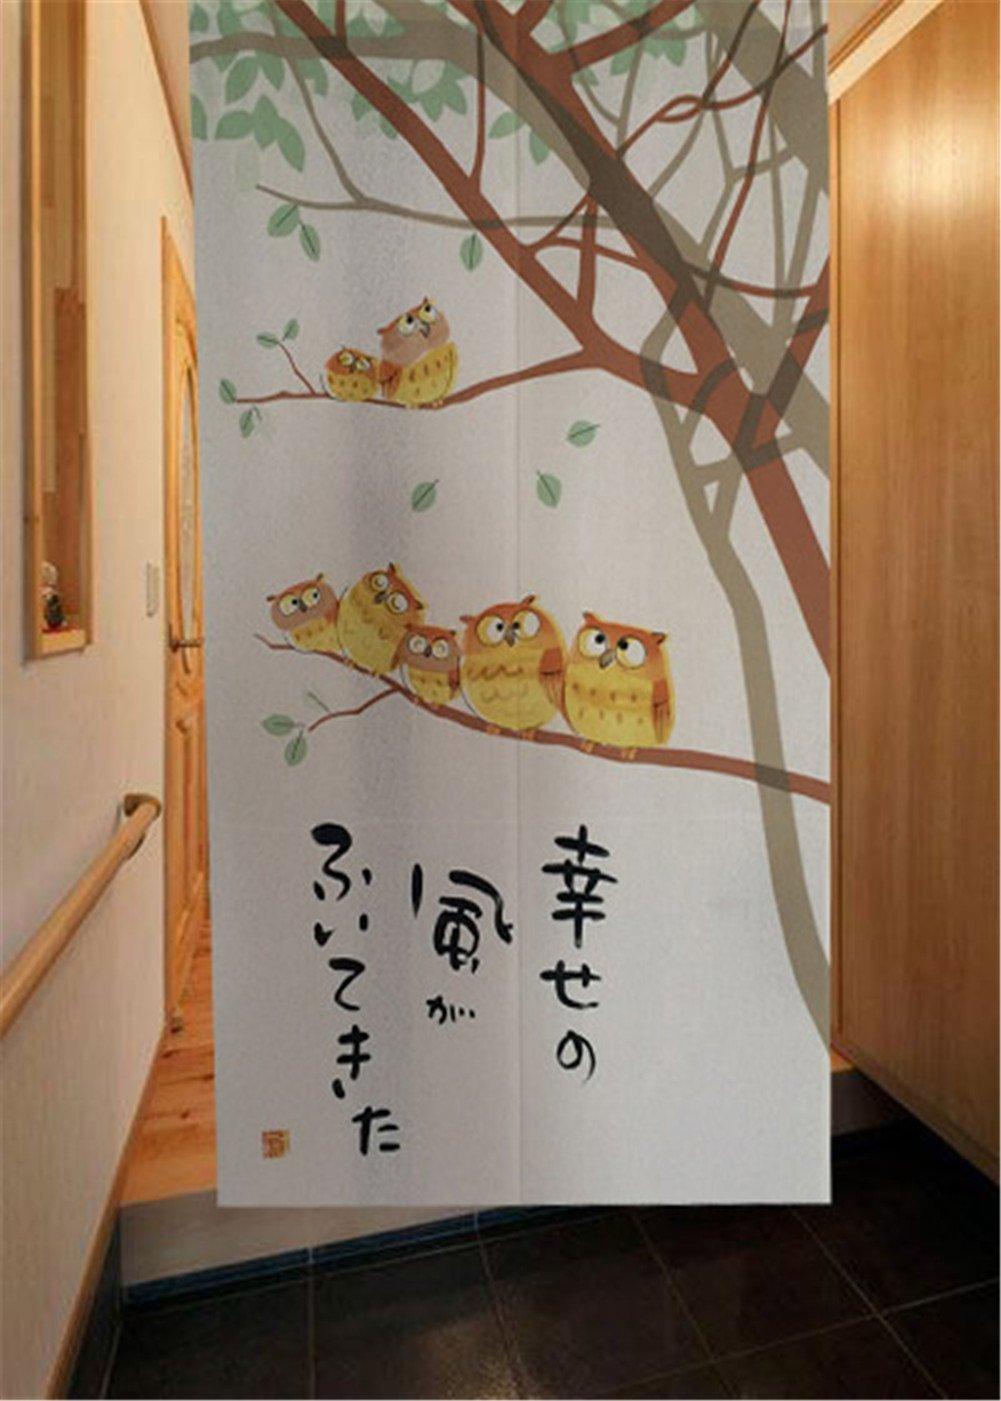 Noren Japanese Doorway Curtainカーテン85 x 150 cm Fishesドアスタイル27   B01FPEC3D2